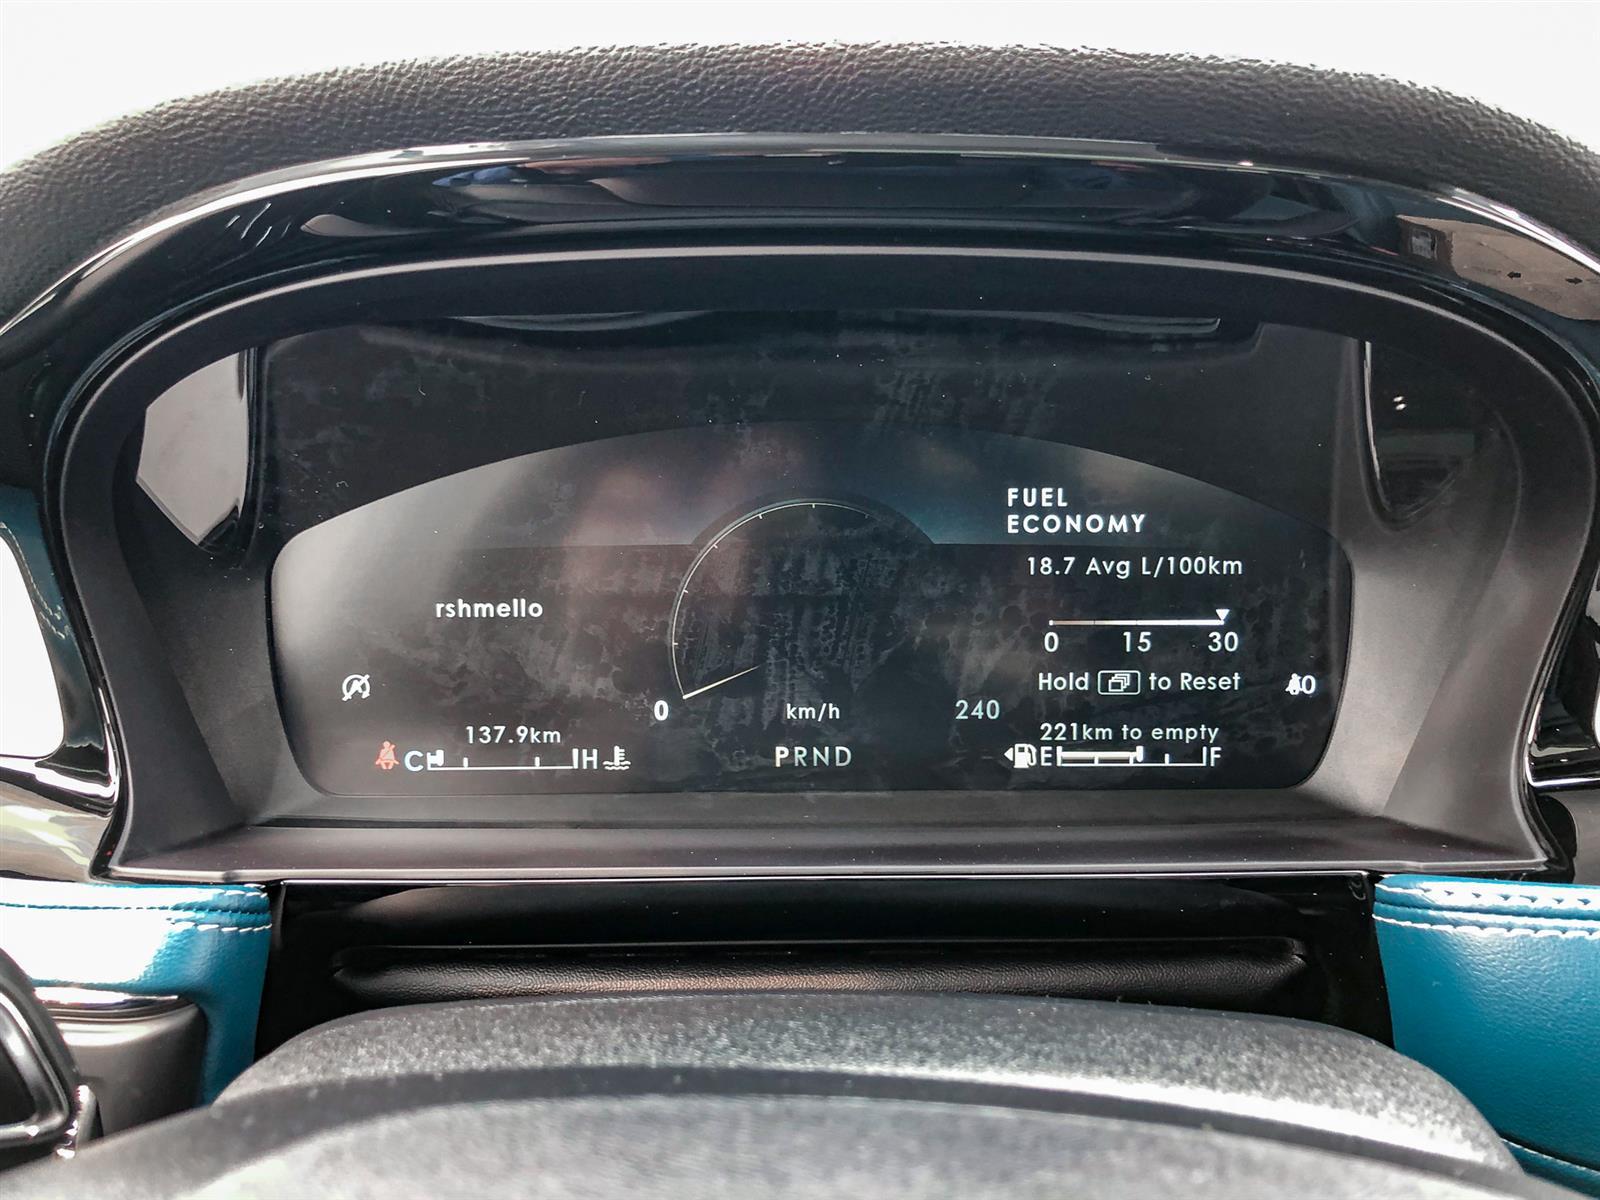 2021 Lincoln Corsair RESERVE | 2.3L TURBO I4 | AWD | 360-DEGREE CAMERA | HEAD-UP DISP